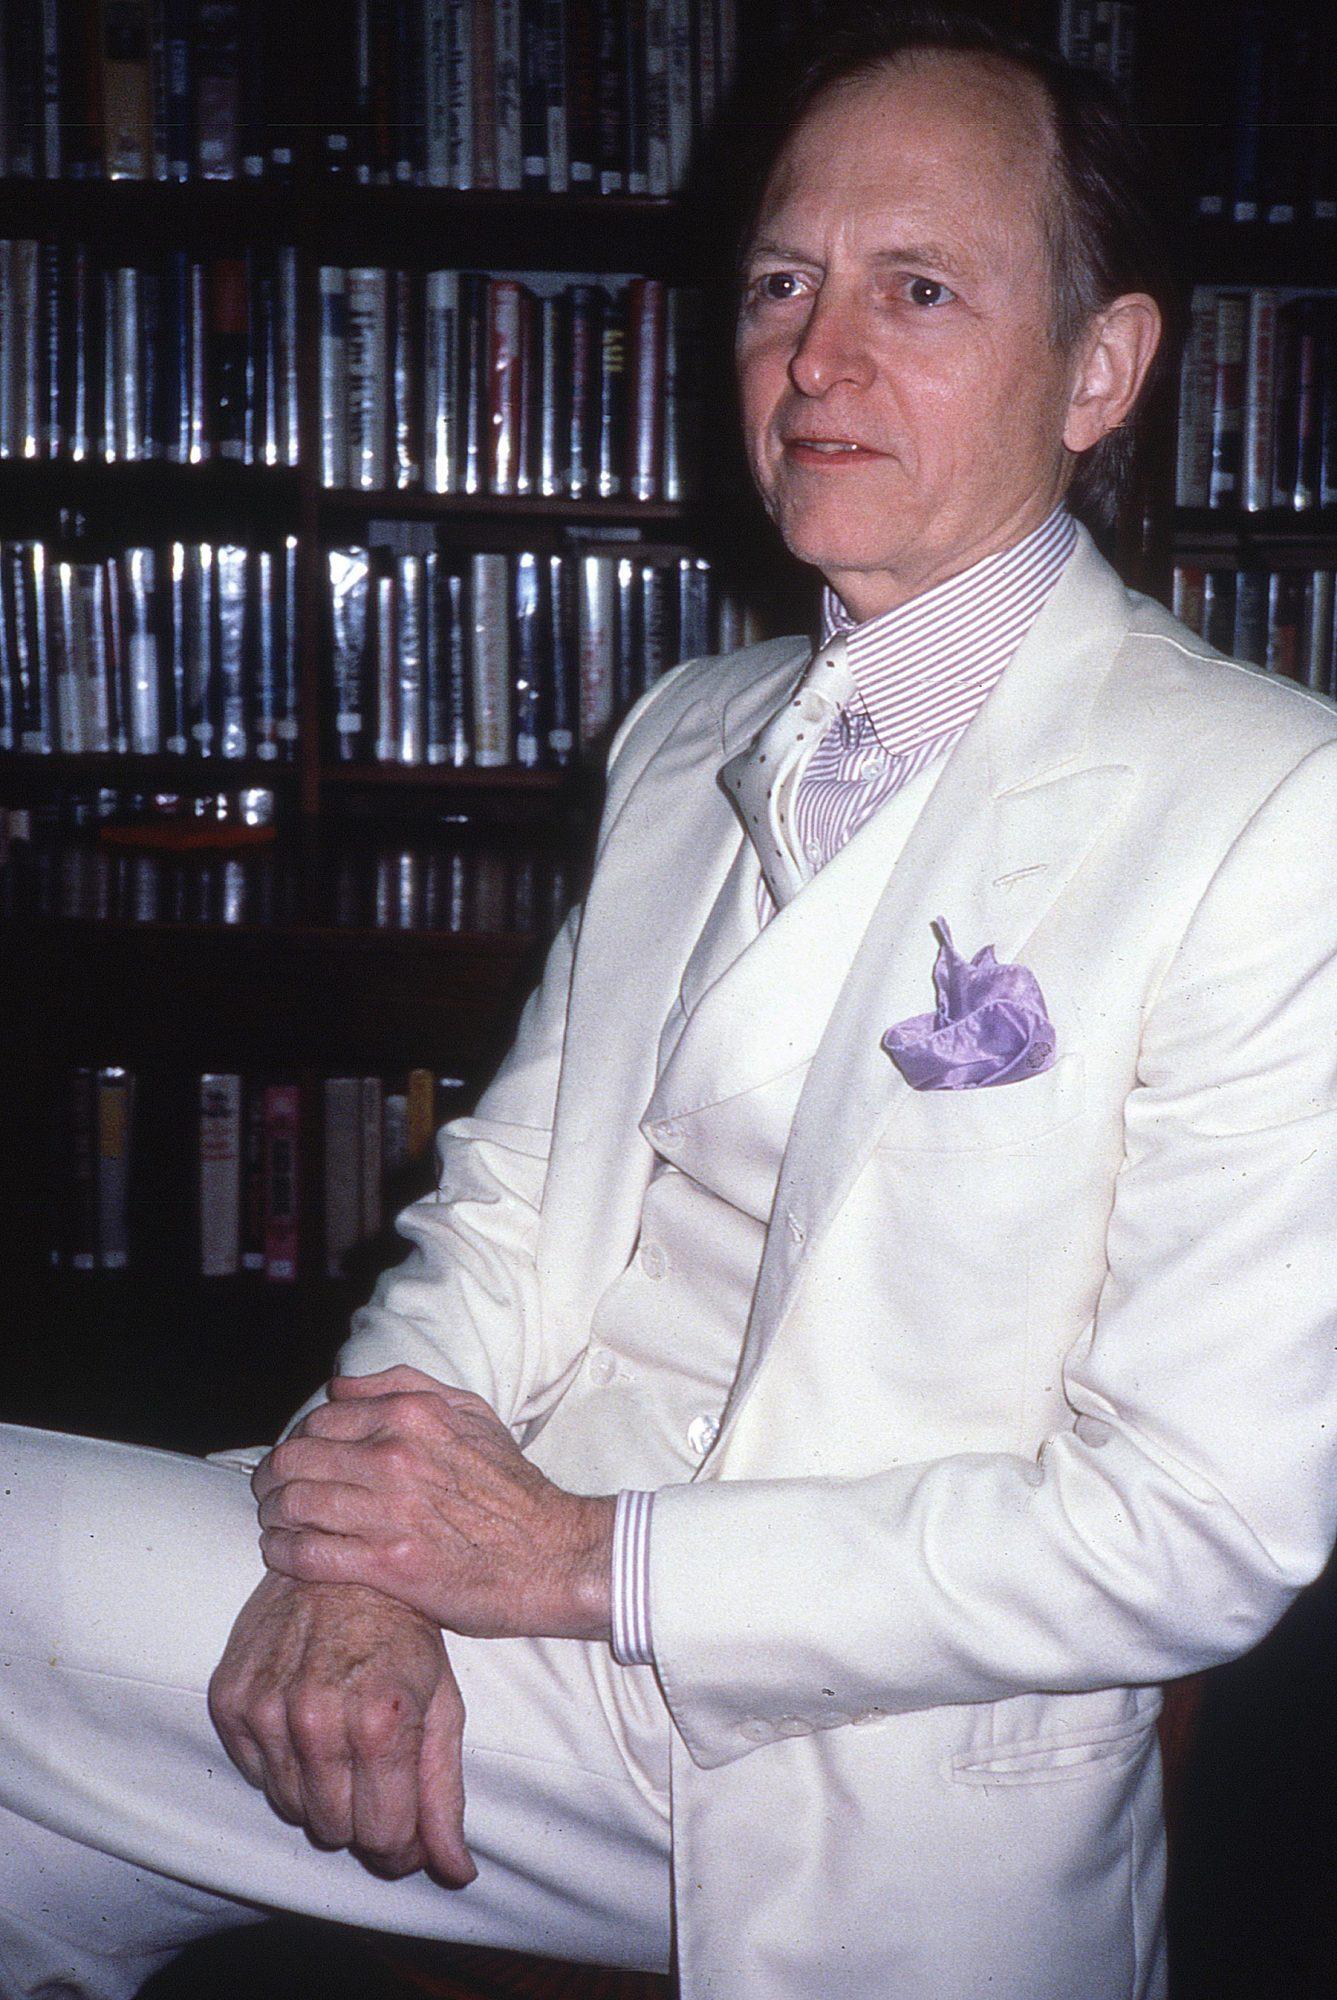 Author Tom Wolfe